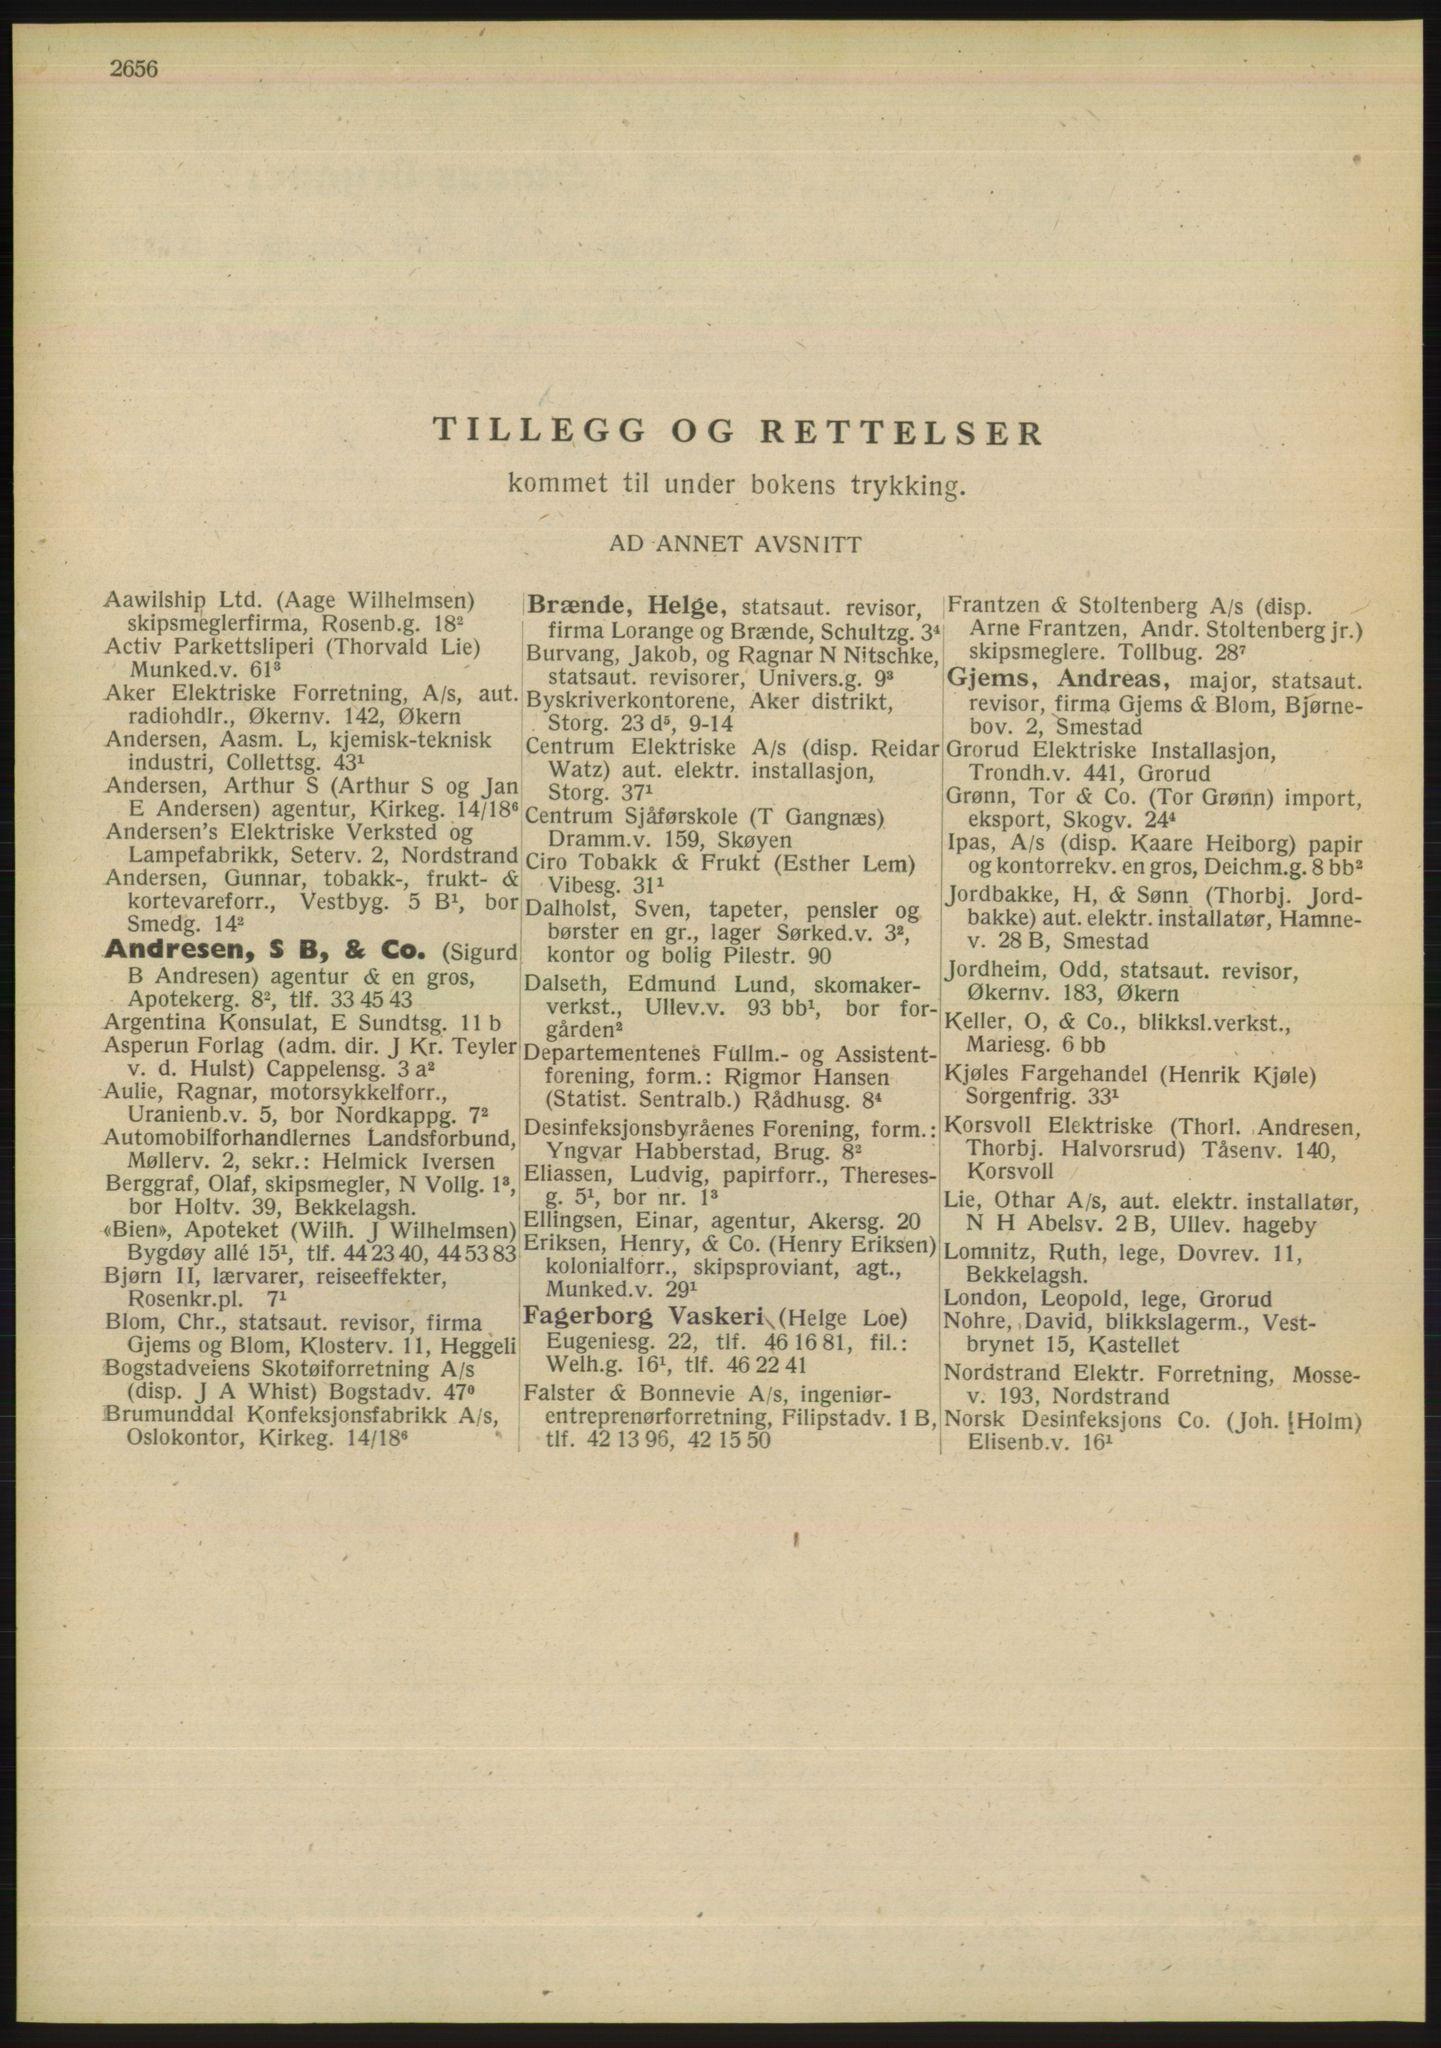 PUBL, Kristiania/Oslo adressebok, 1948, p. 2656